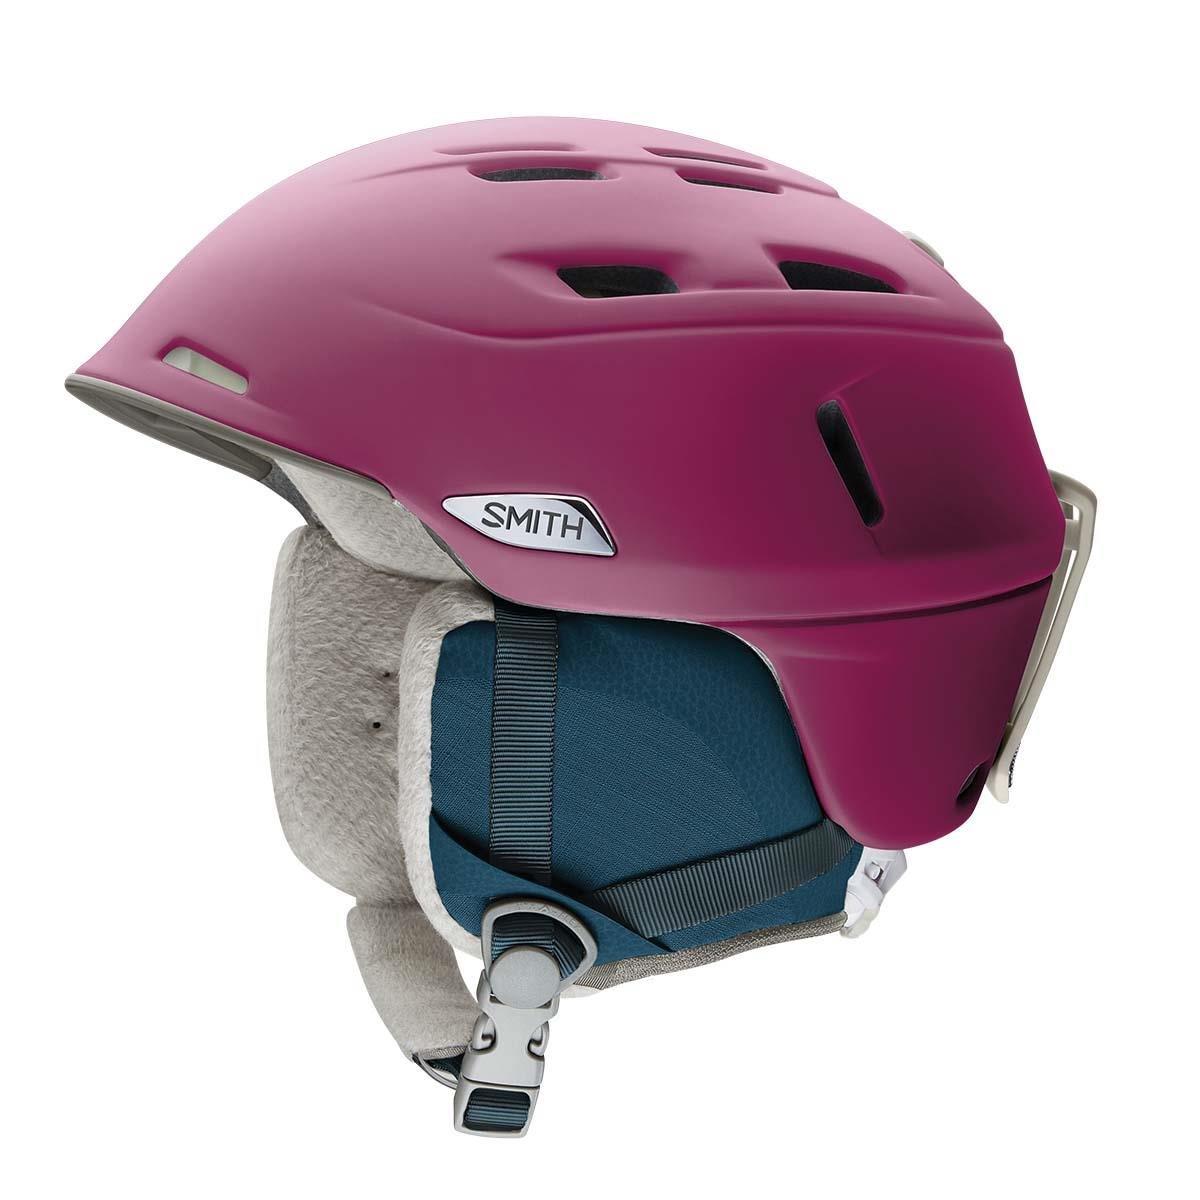 Smith OpticsコンパスMIPS大人用スキースノーモービルヘルメット – メタリックPepper B074KP4LYY  Matte Grape Small